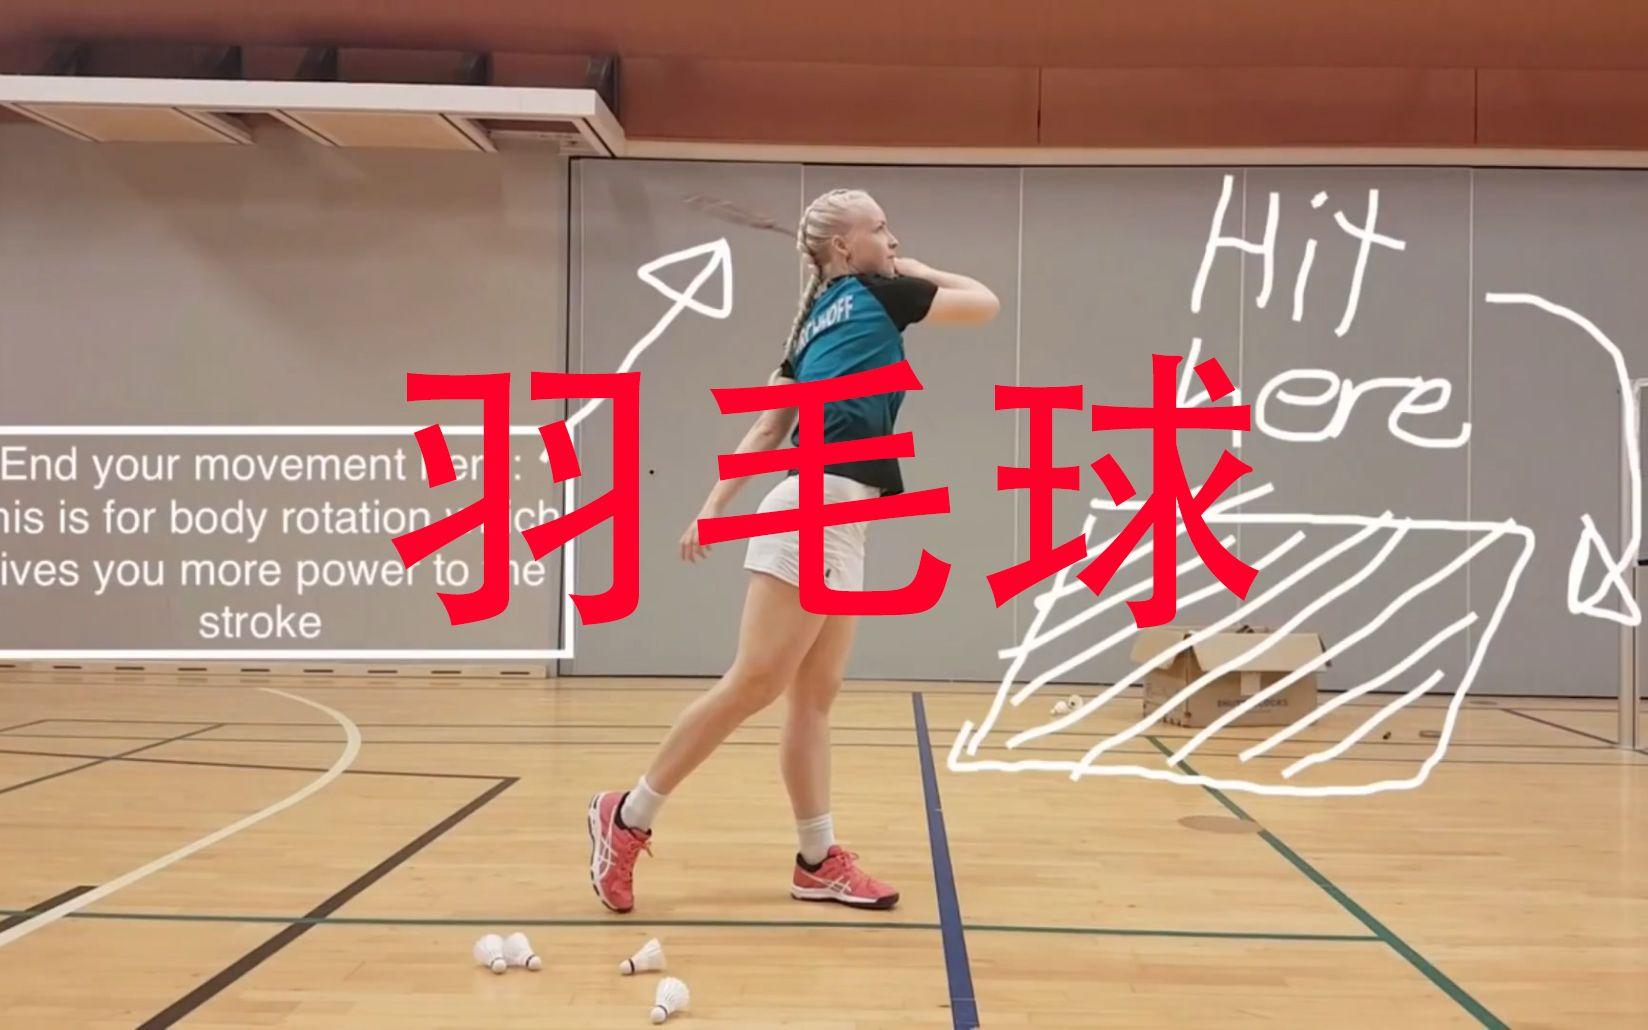 【羽毛球搬運】從零開始的羽毛球教程   握拍/正手/反手/步法 等等《Shuttle Life》_嗶哩嗶哩 (゜-゜)つロ 干杯 ...